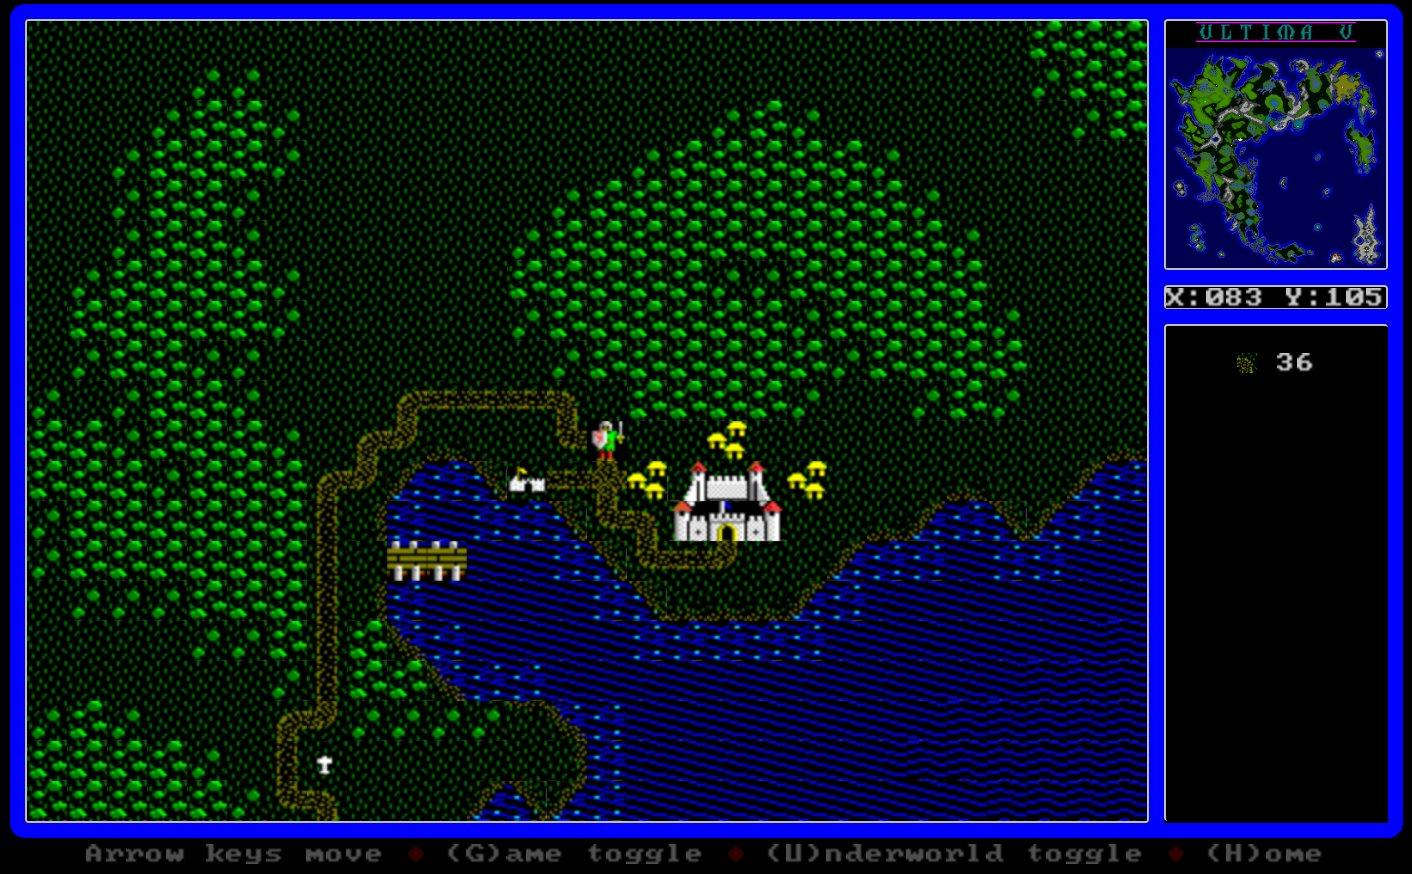 The Ultima IV/V Map Explorer